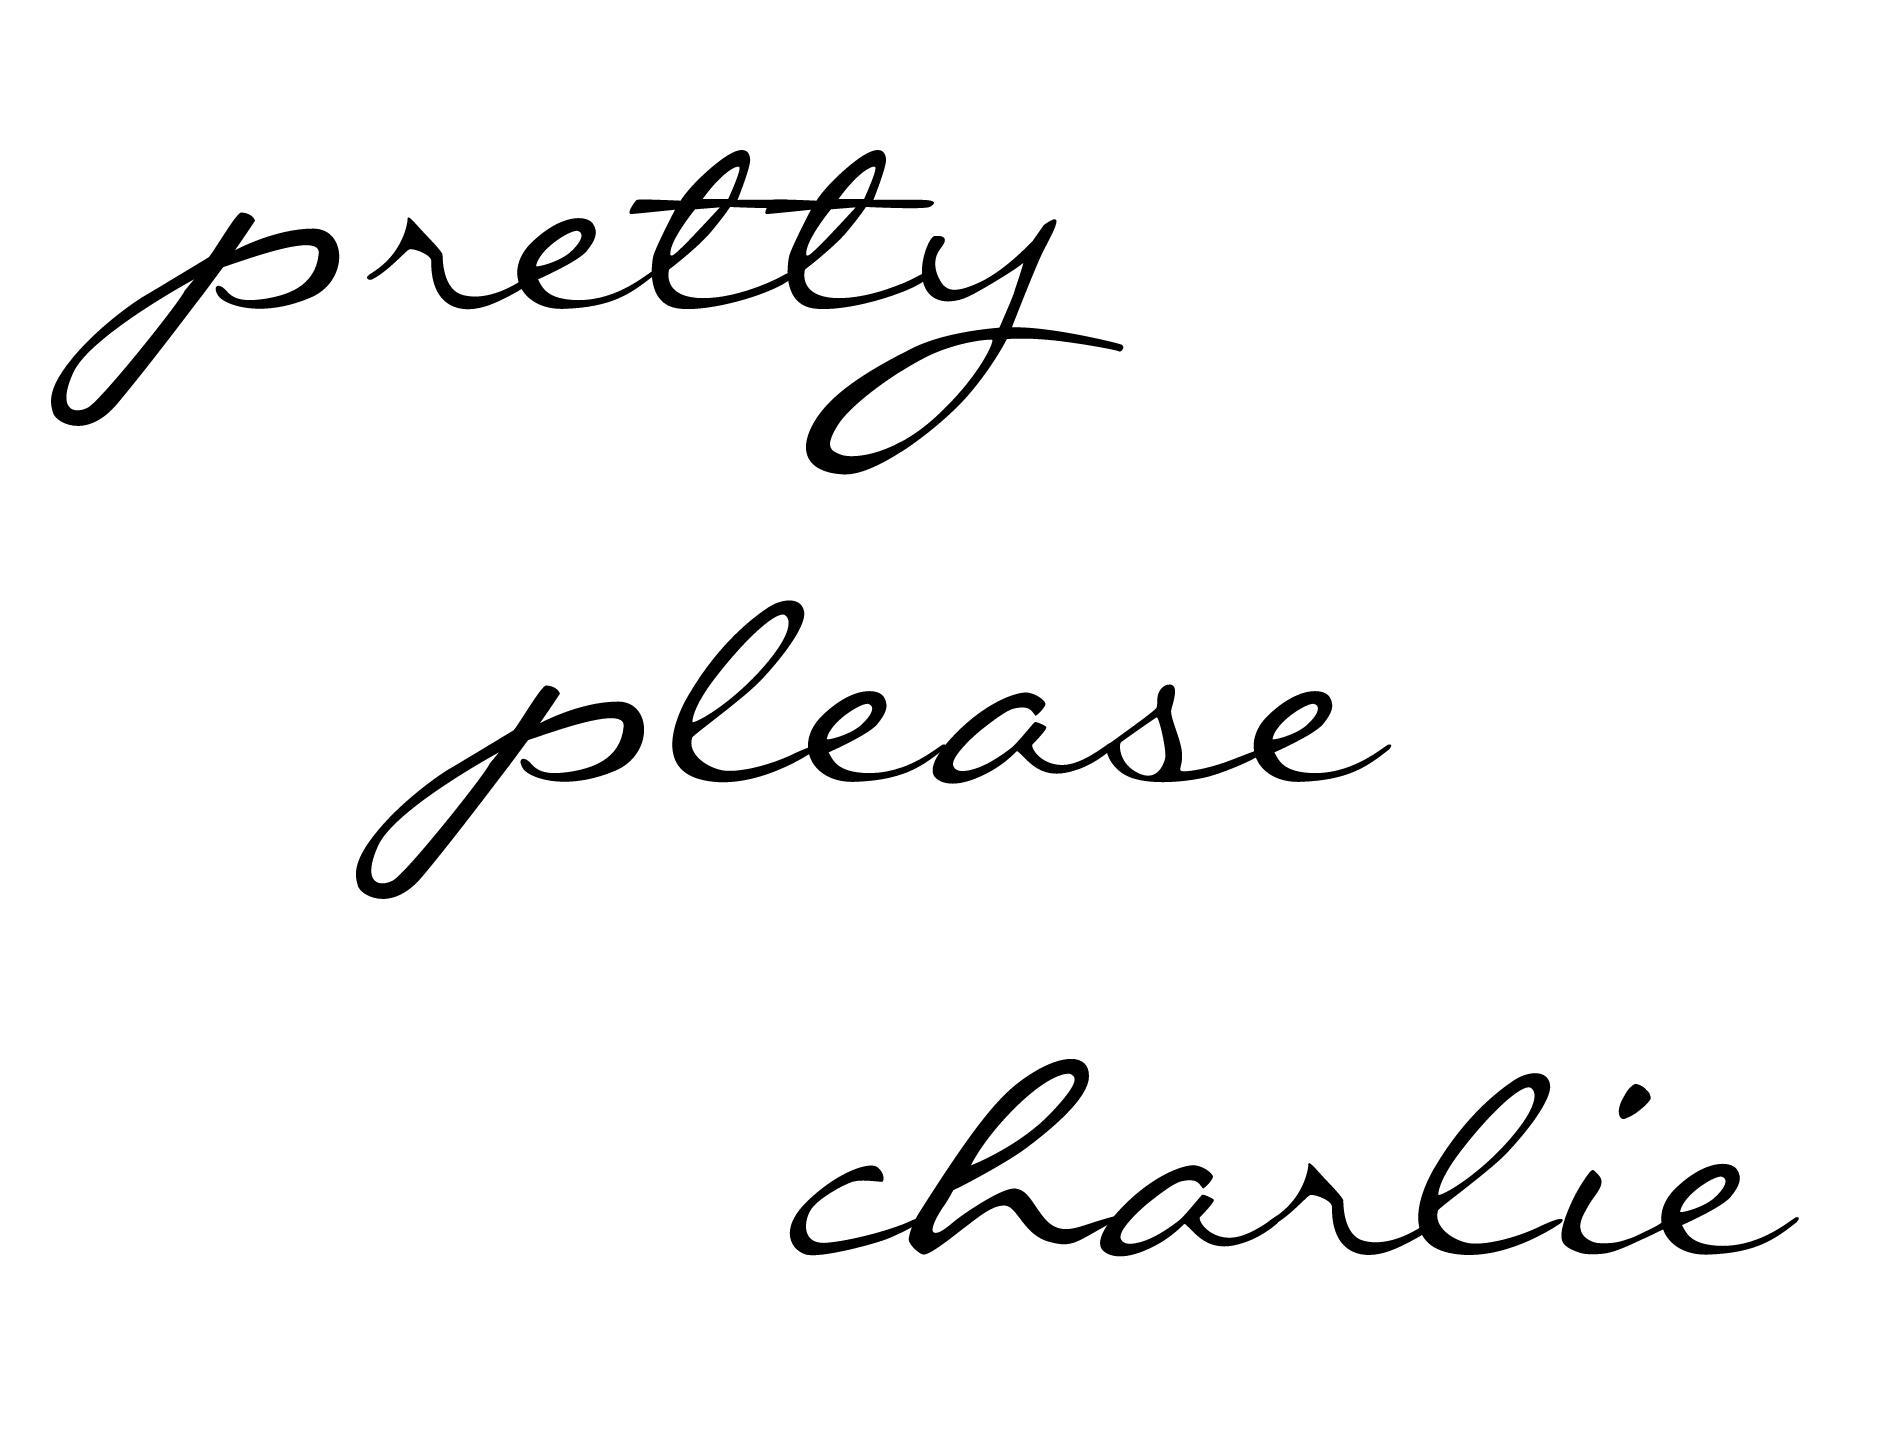 Pretty Please Charlie